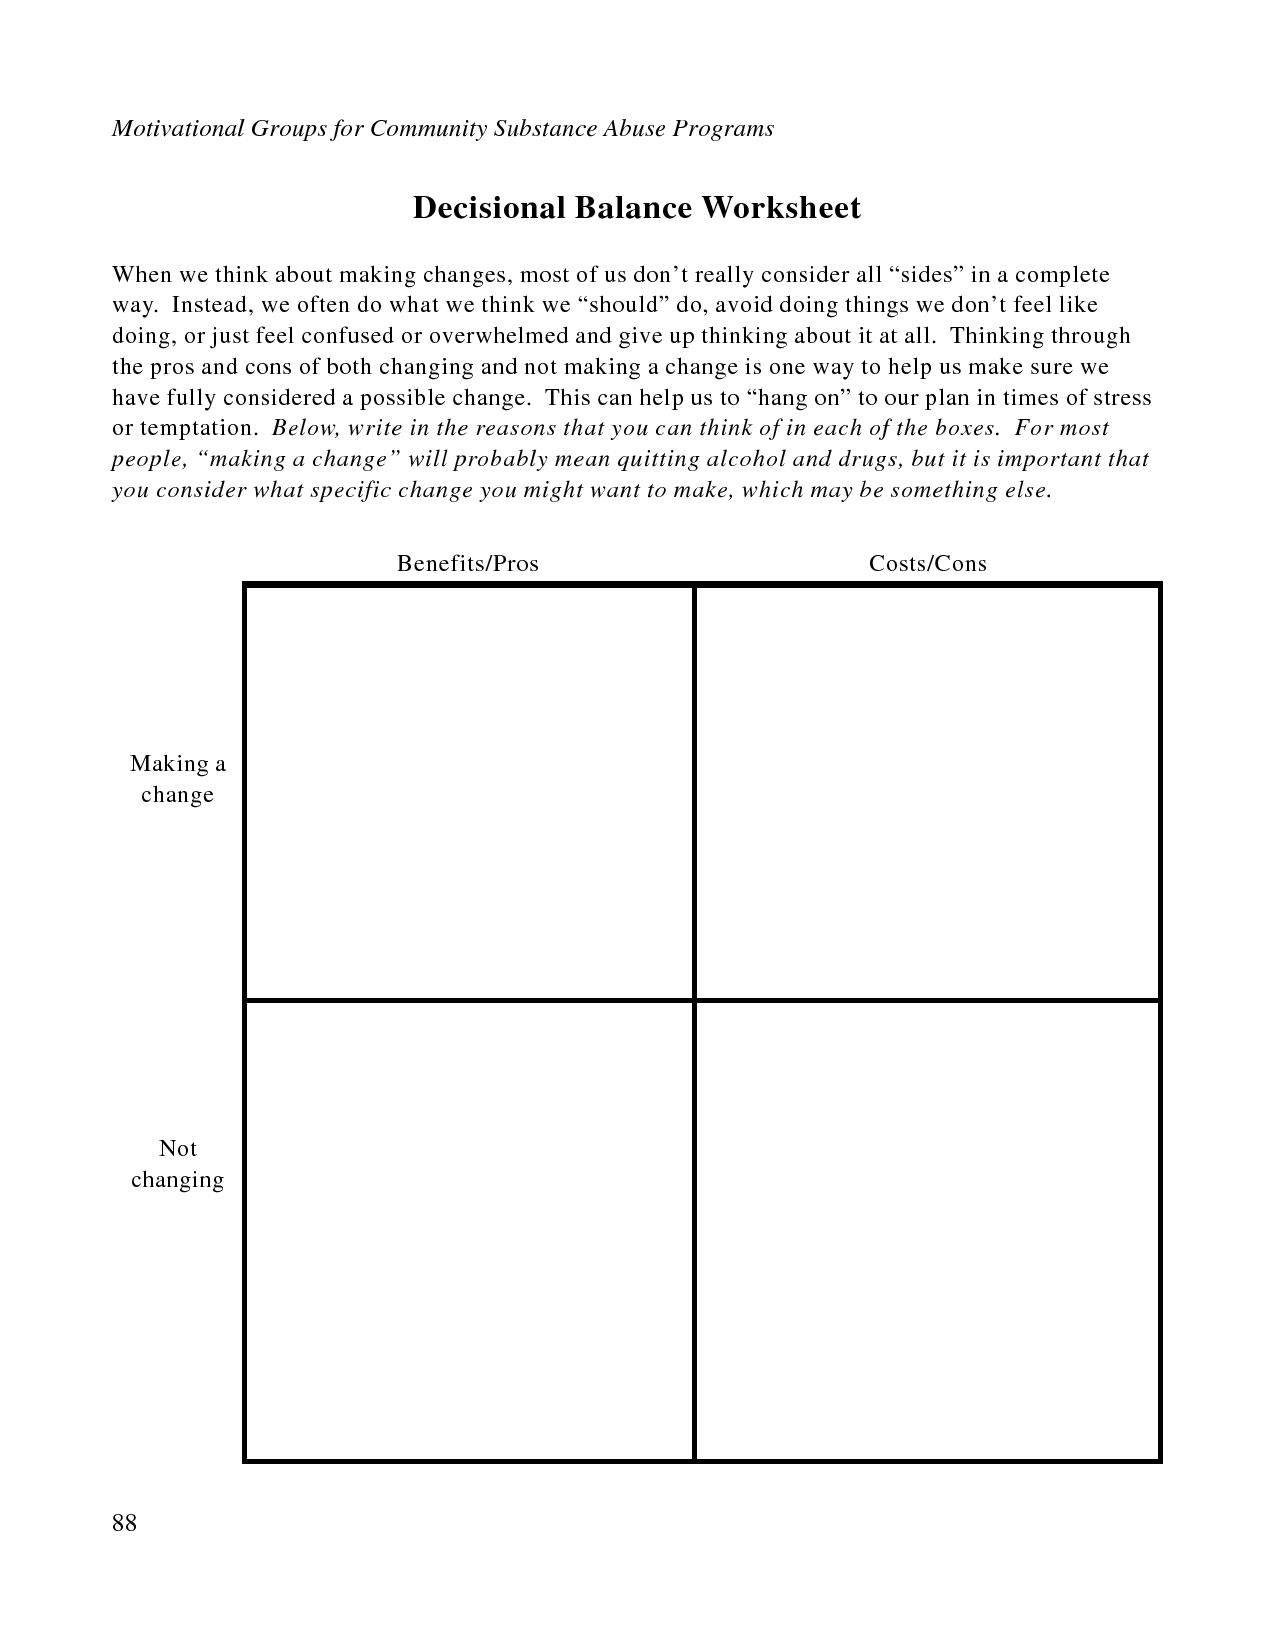 Free Printable Dbt Worksheets   Decisional Balance Worksheet - Pdf - Free Printable Recovery Games